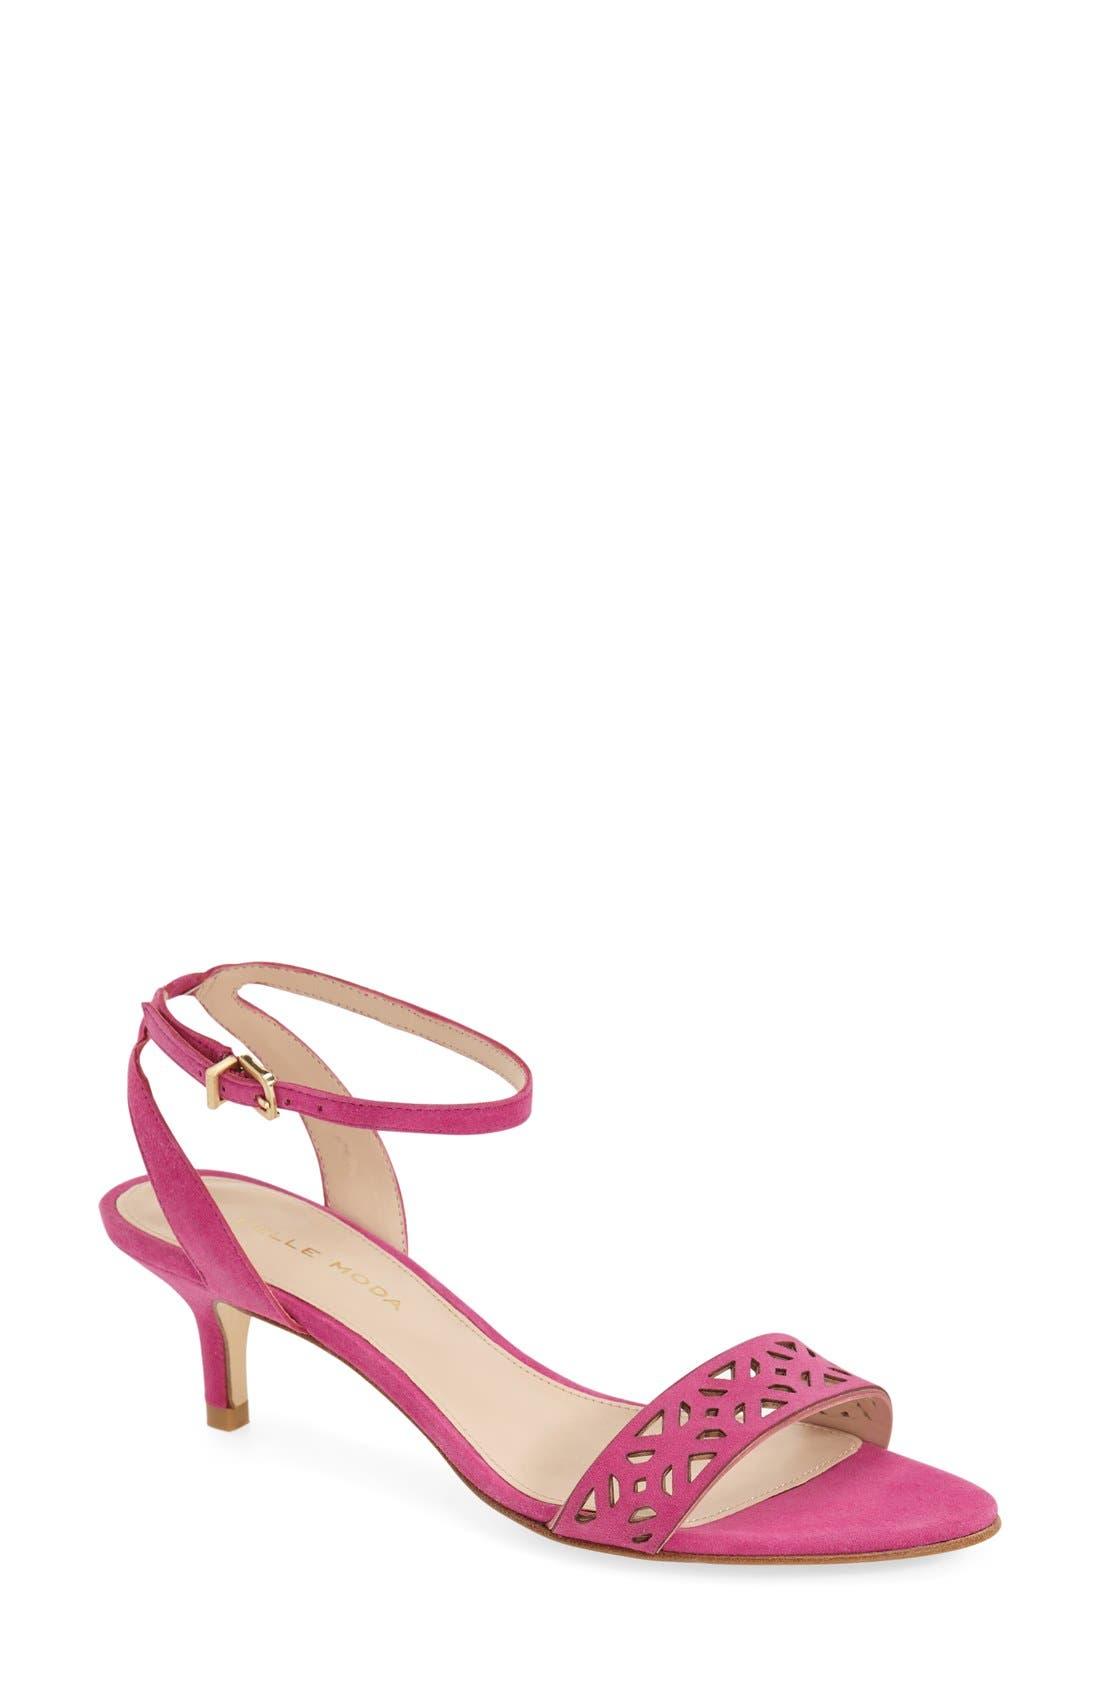 'Otis' Ankle Strap Sandal,                             Main thumbnail 6, color,